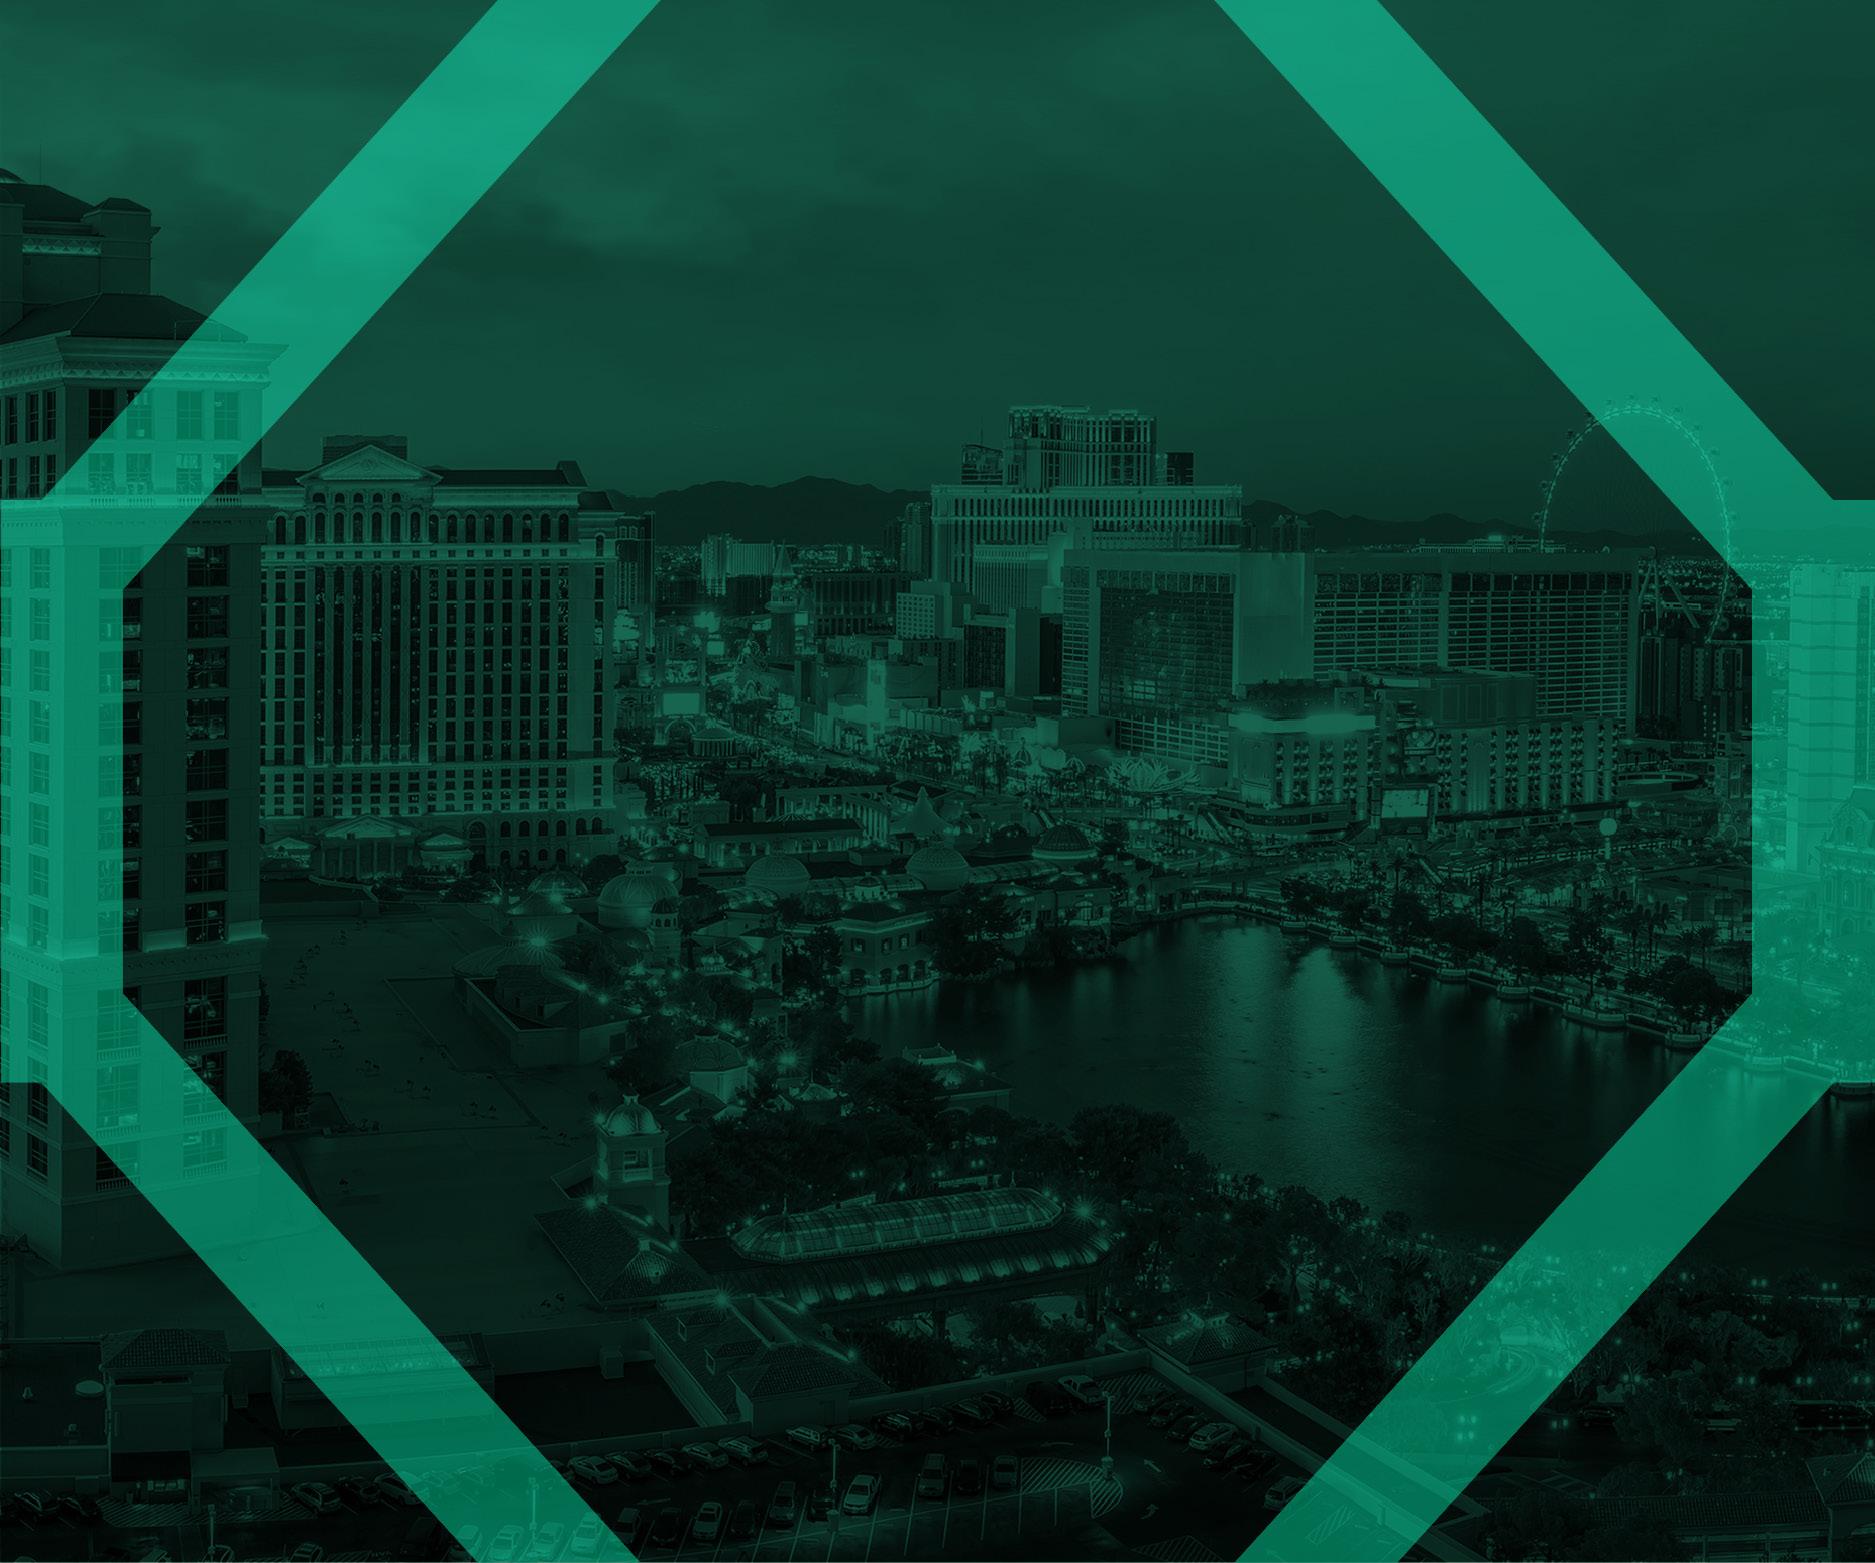 Next week: P.S.R. 2019 comes to Las Vegas